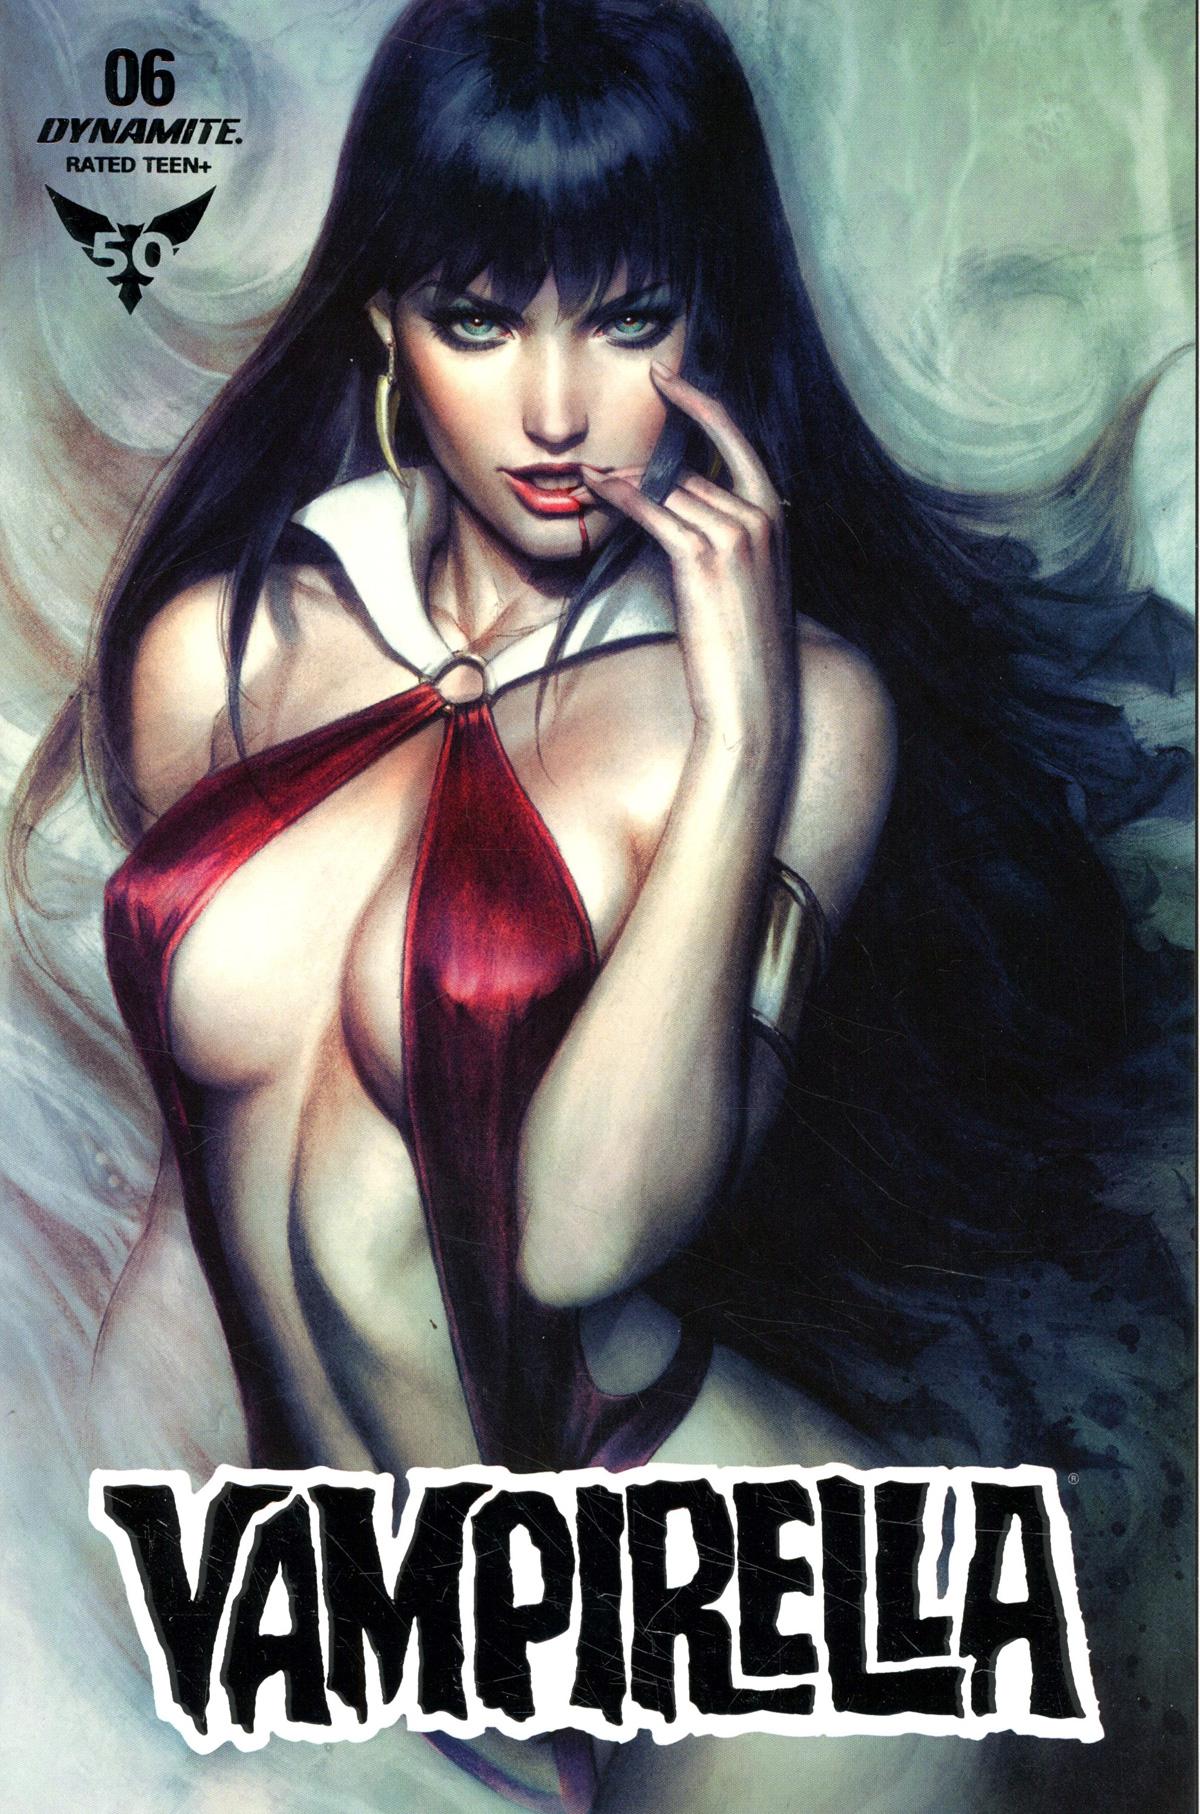 Vampirella Vol 8 #6 Cover Z-B Ultra-Limited Edition Stanley Artgerm Lau Platinum Foil Cover